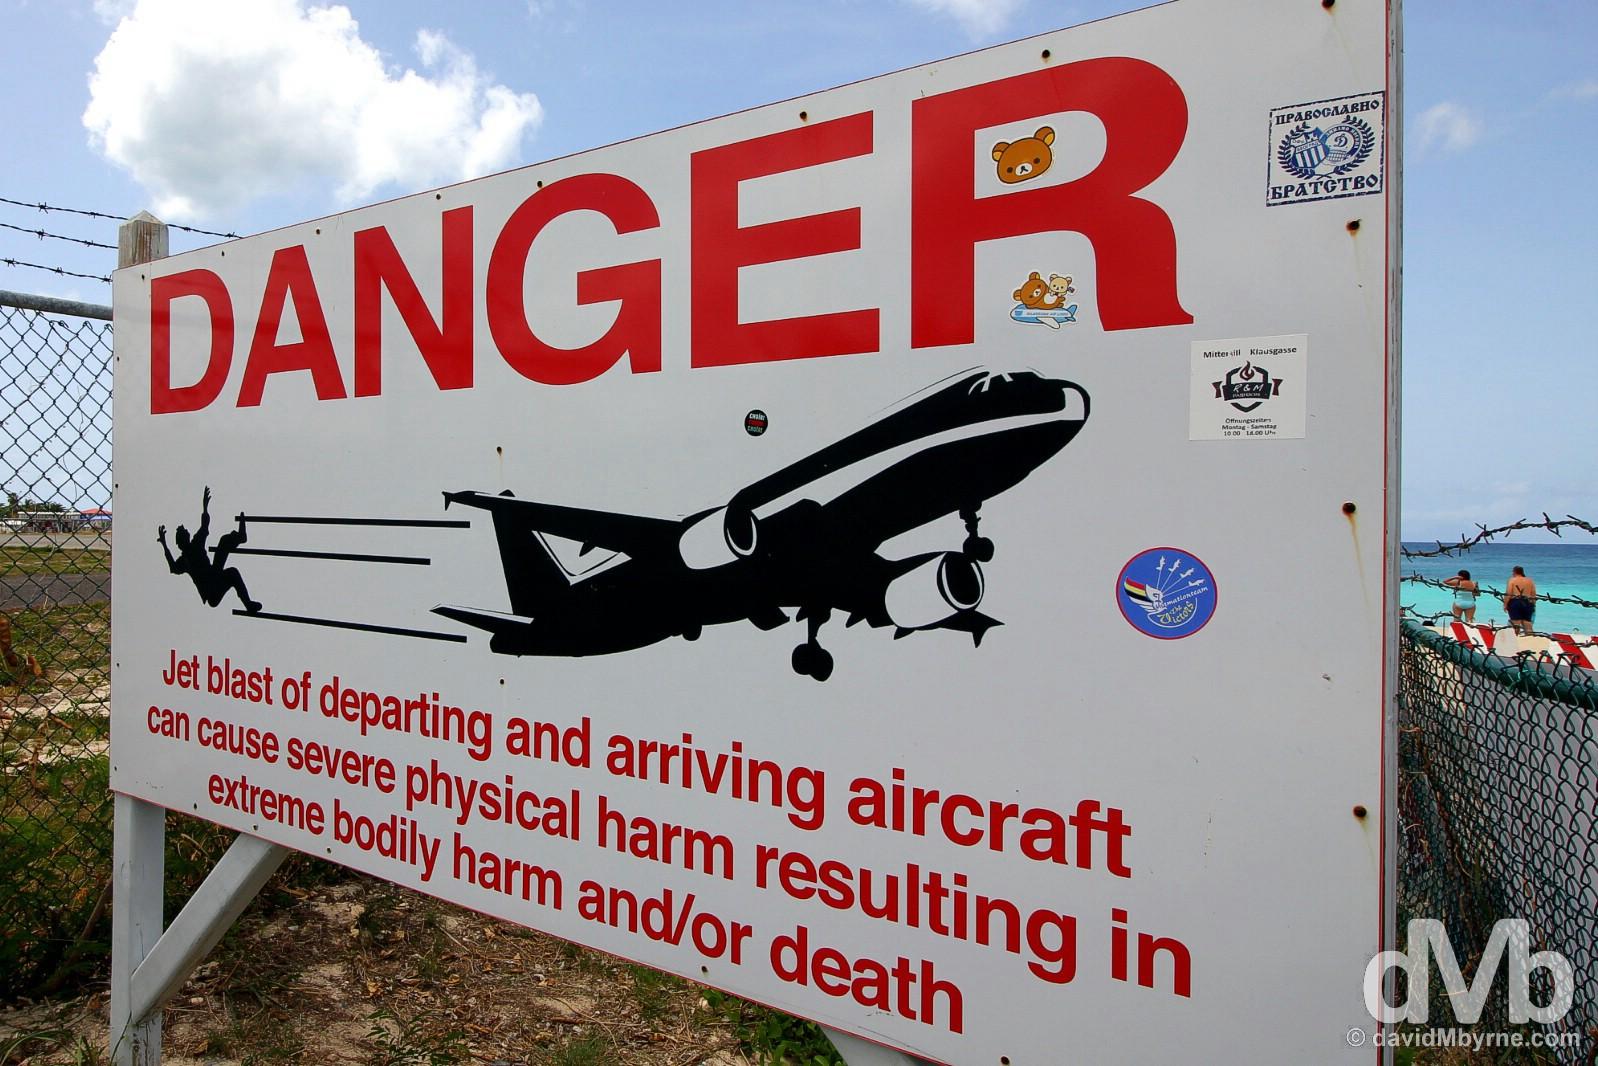 Danger. Signage at Maho Bay, Sint Maarten, Lesser Antilles. June 9, 2015.